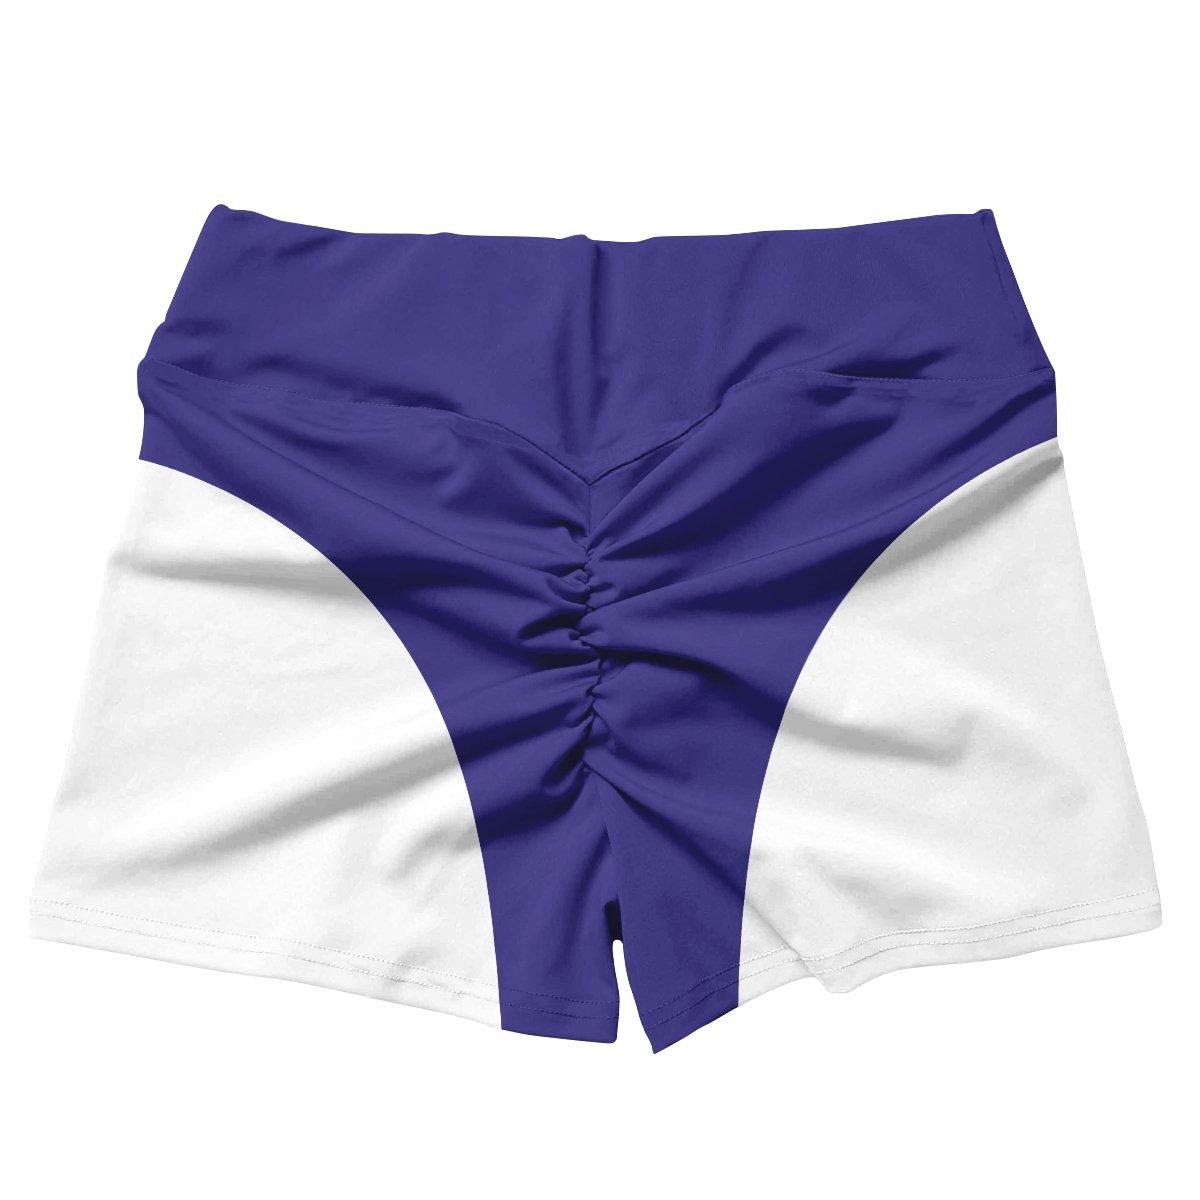 nagatoro active wear set 837187 - Anime Swimsuits